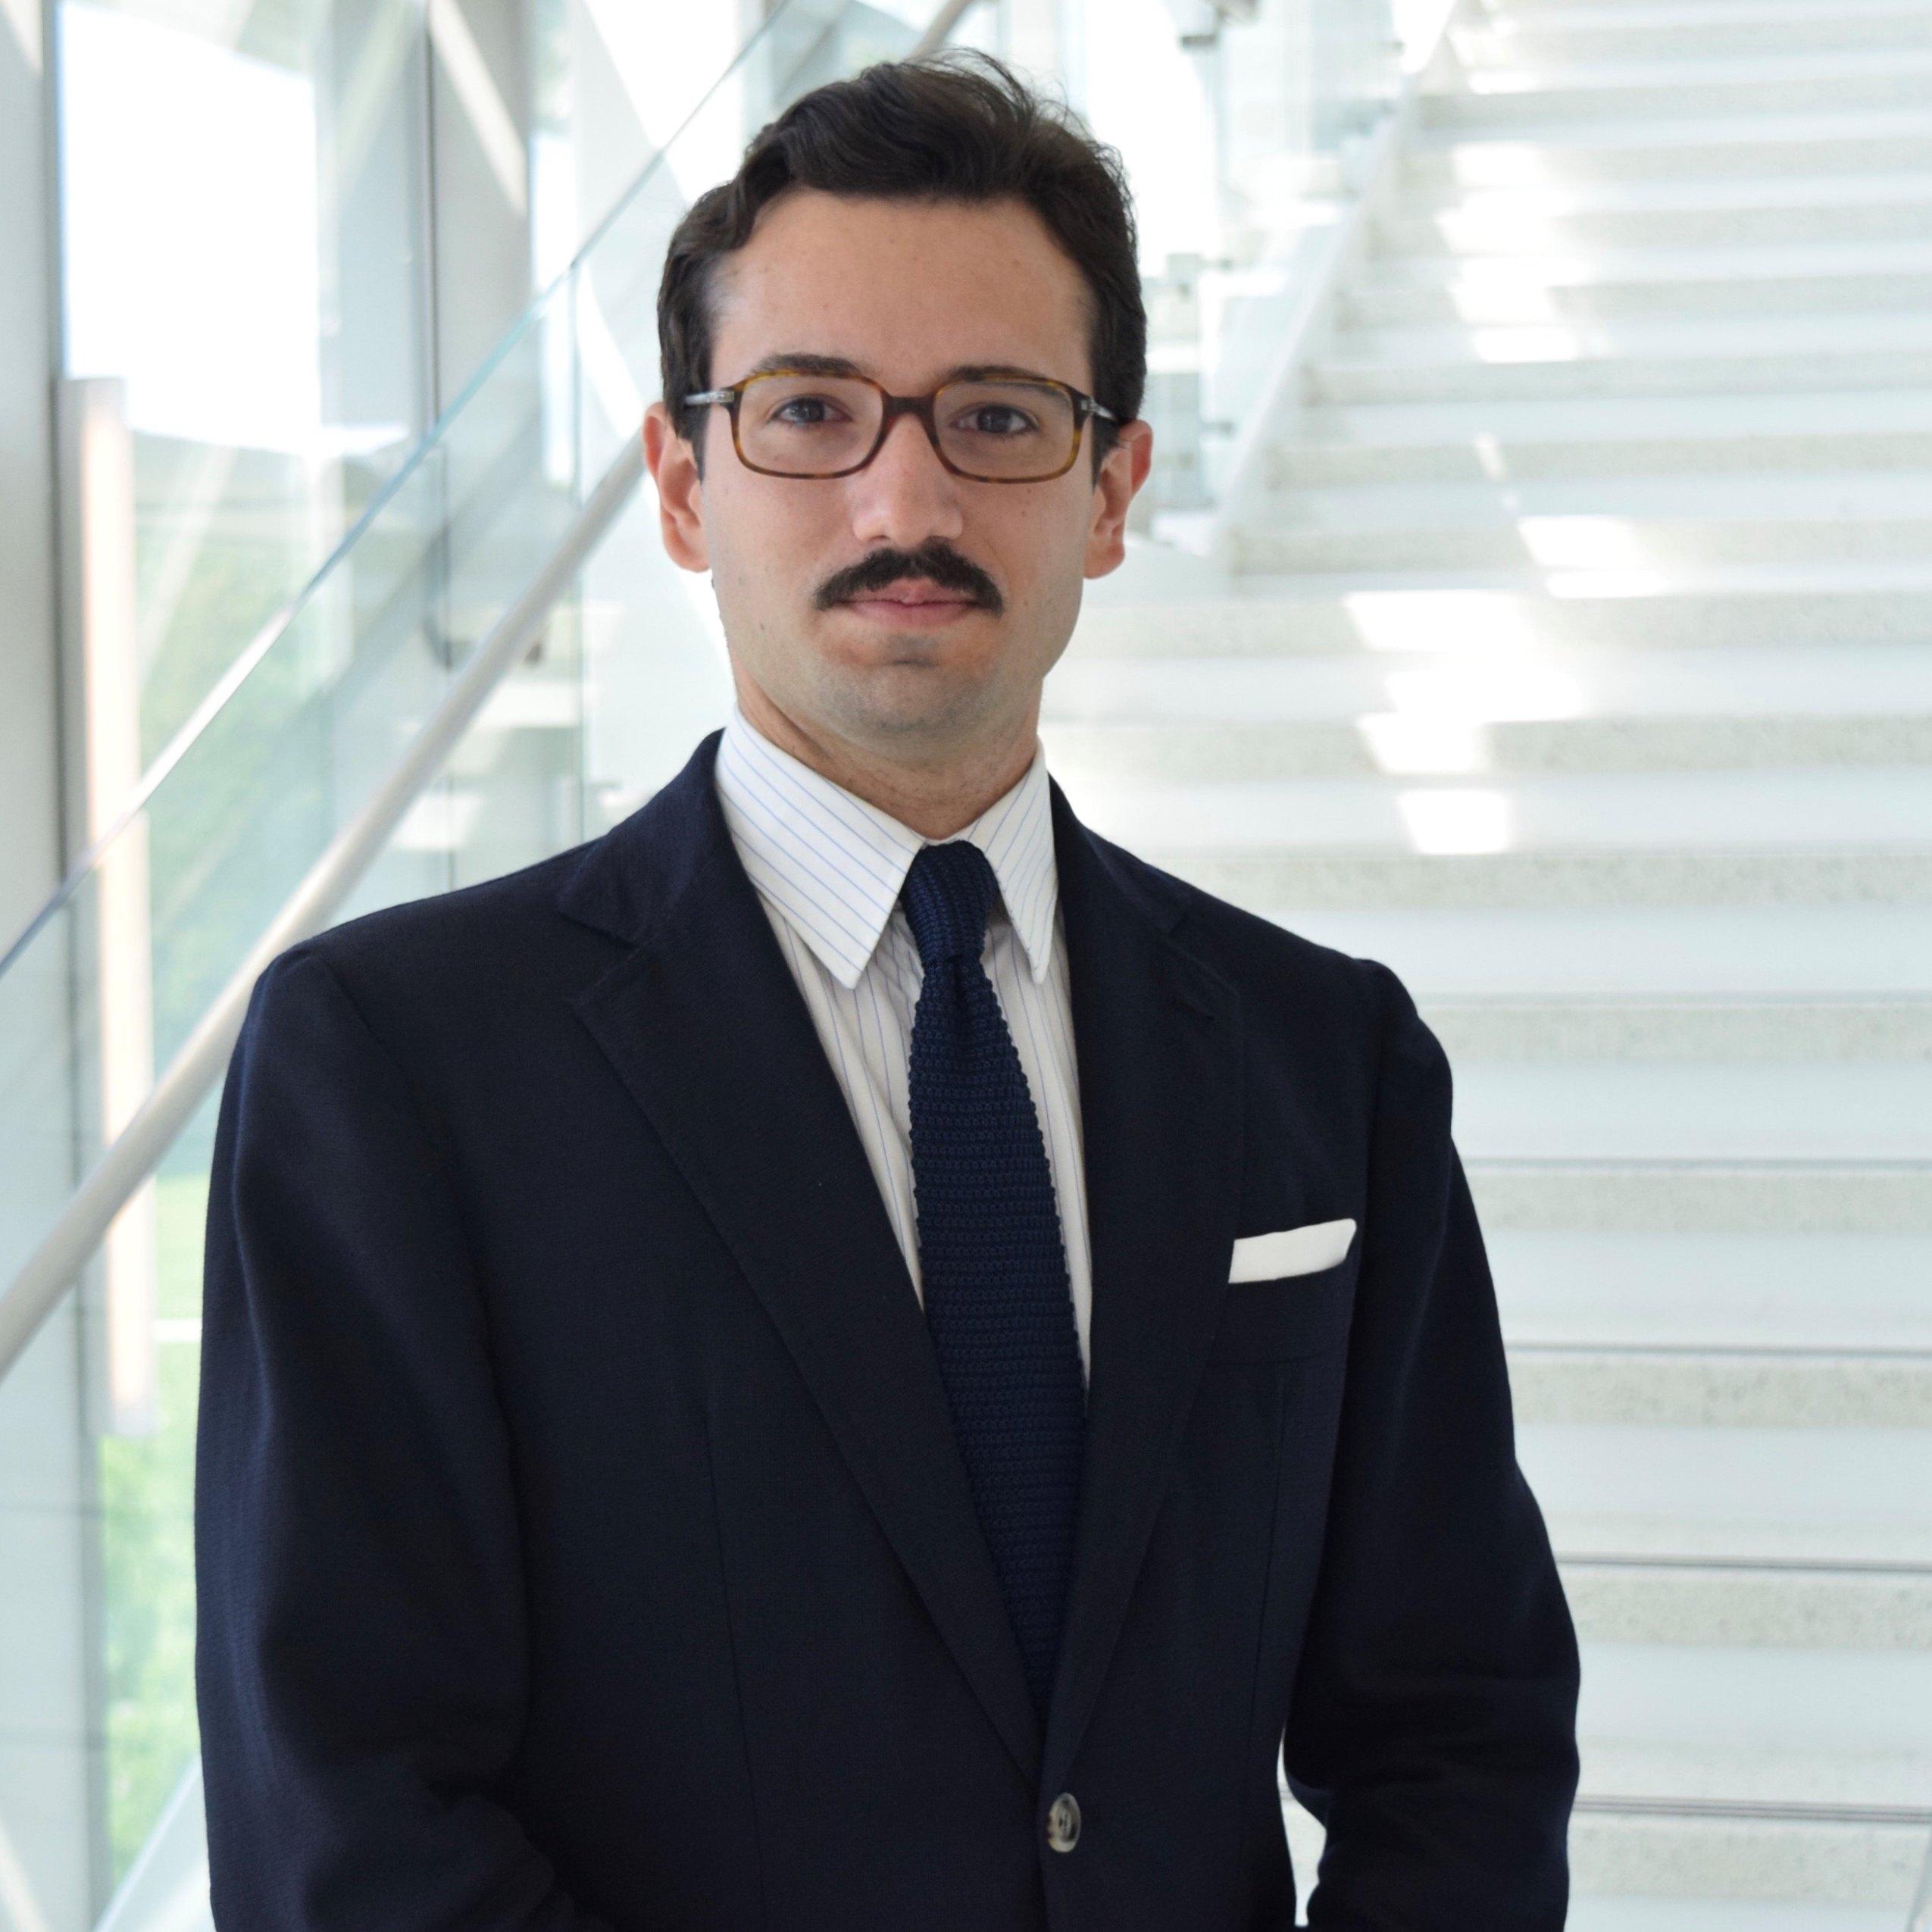 Dr. Antonio Morelli